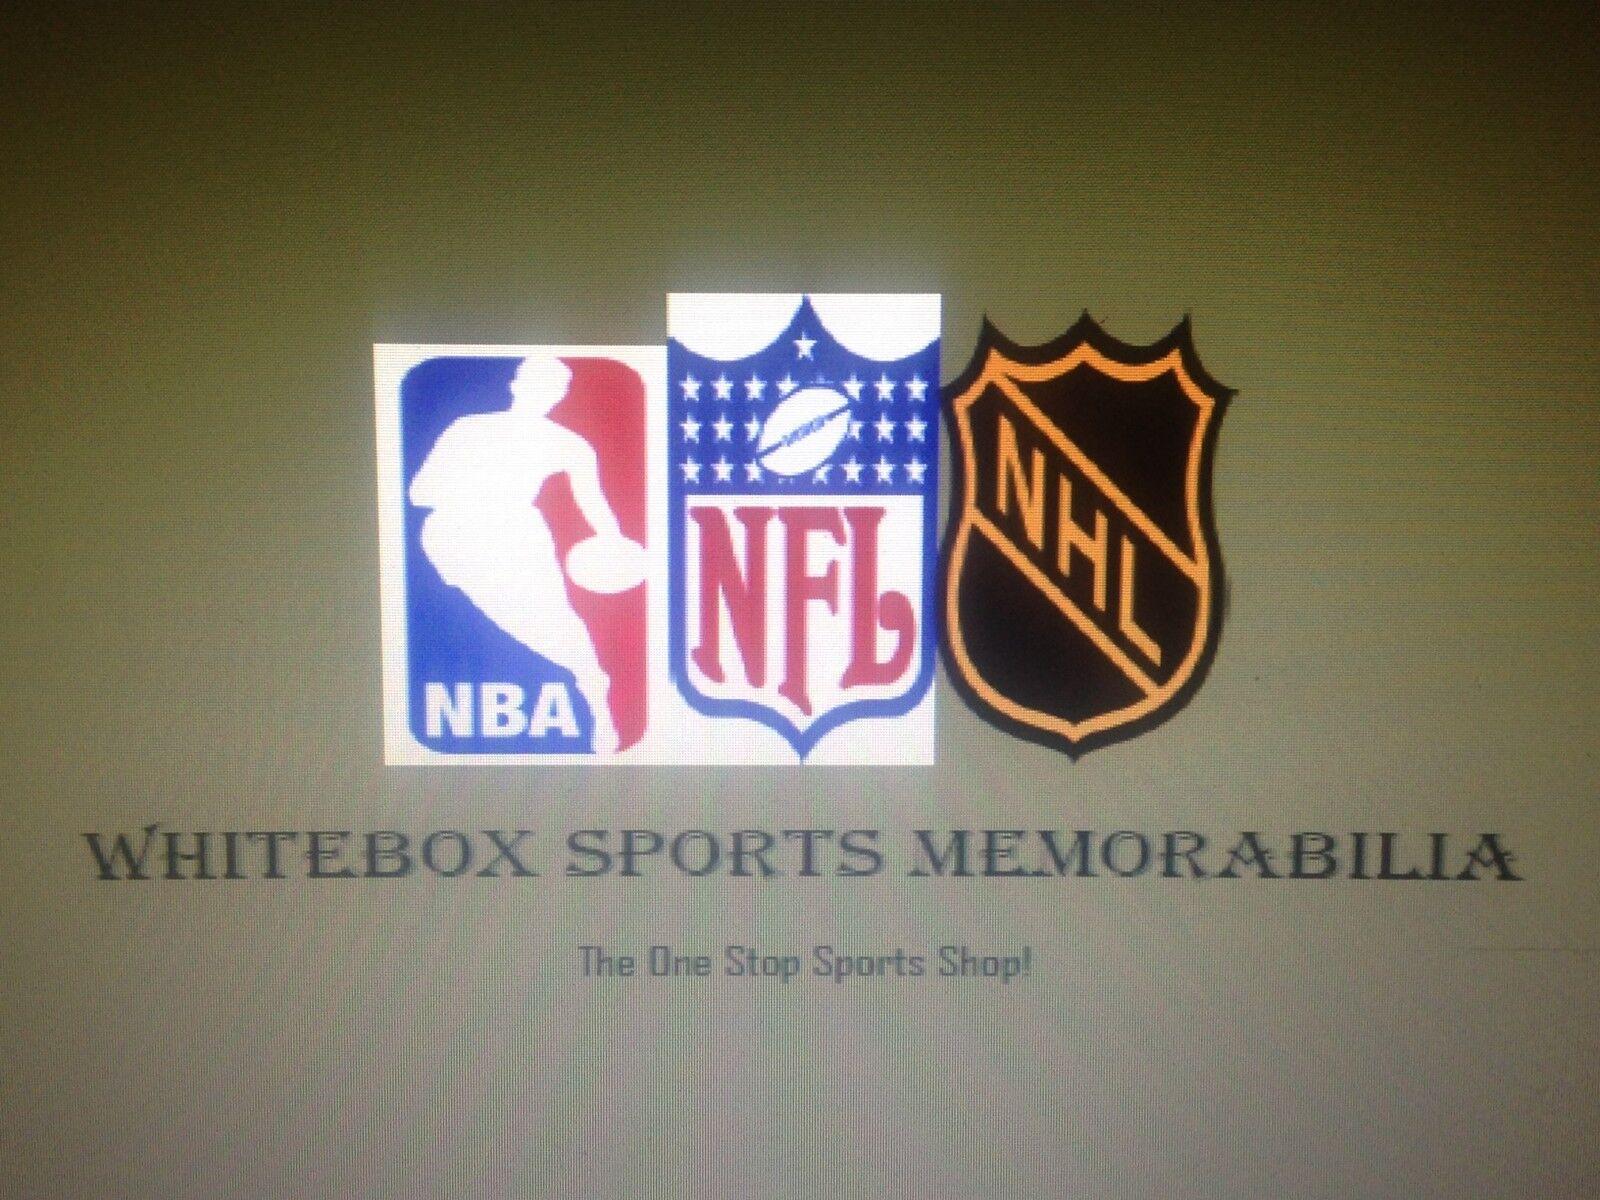 Whitebox Sports Memorabilia